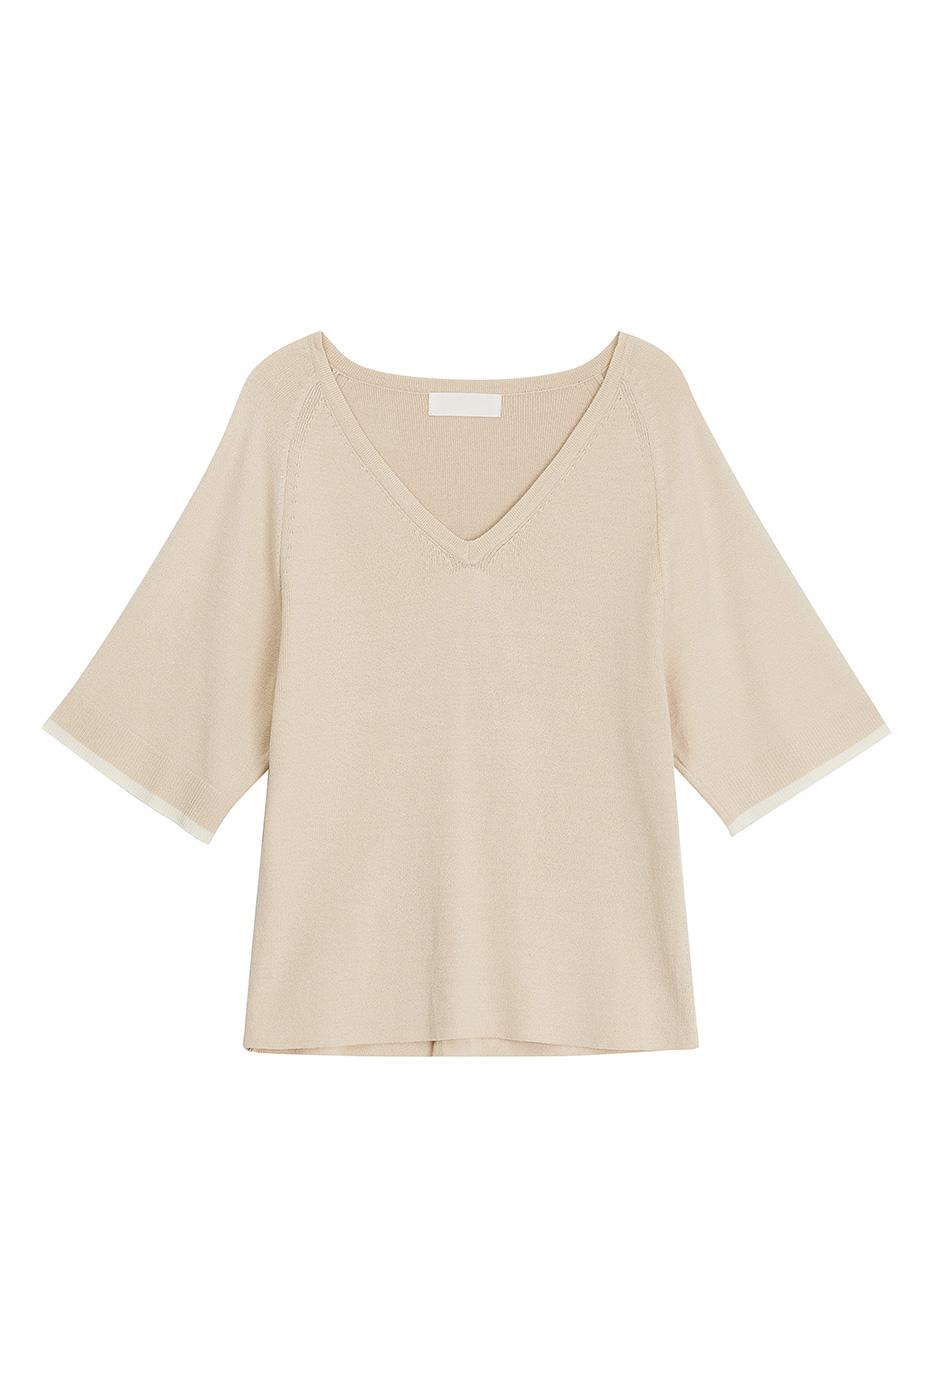 Plain V-Neck Knitwear Top